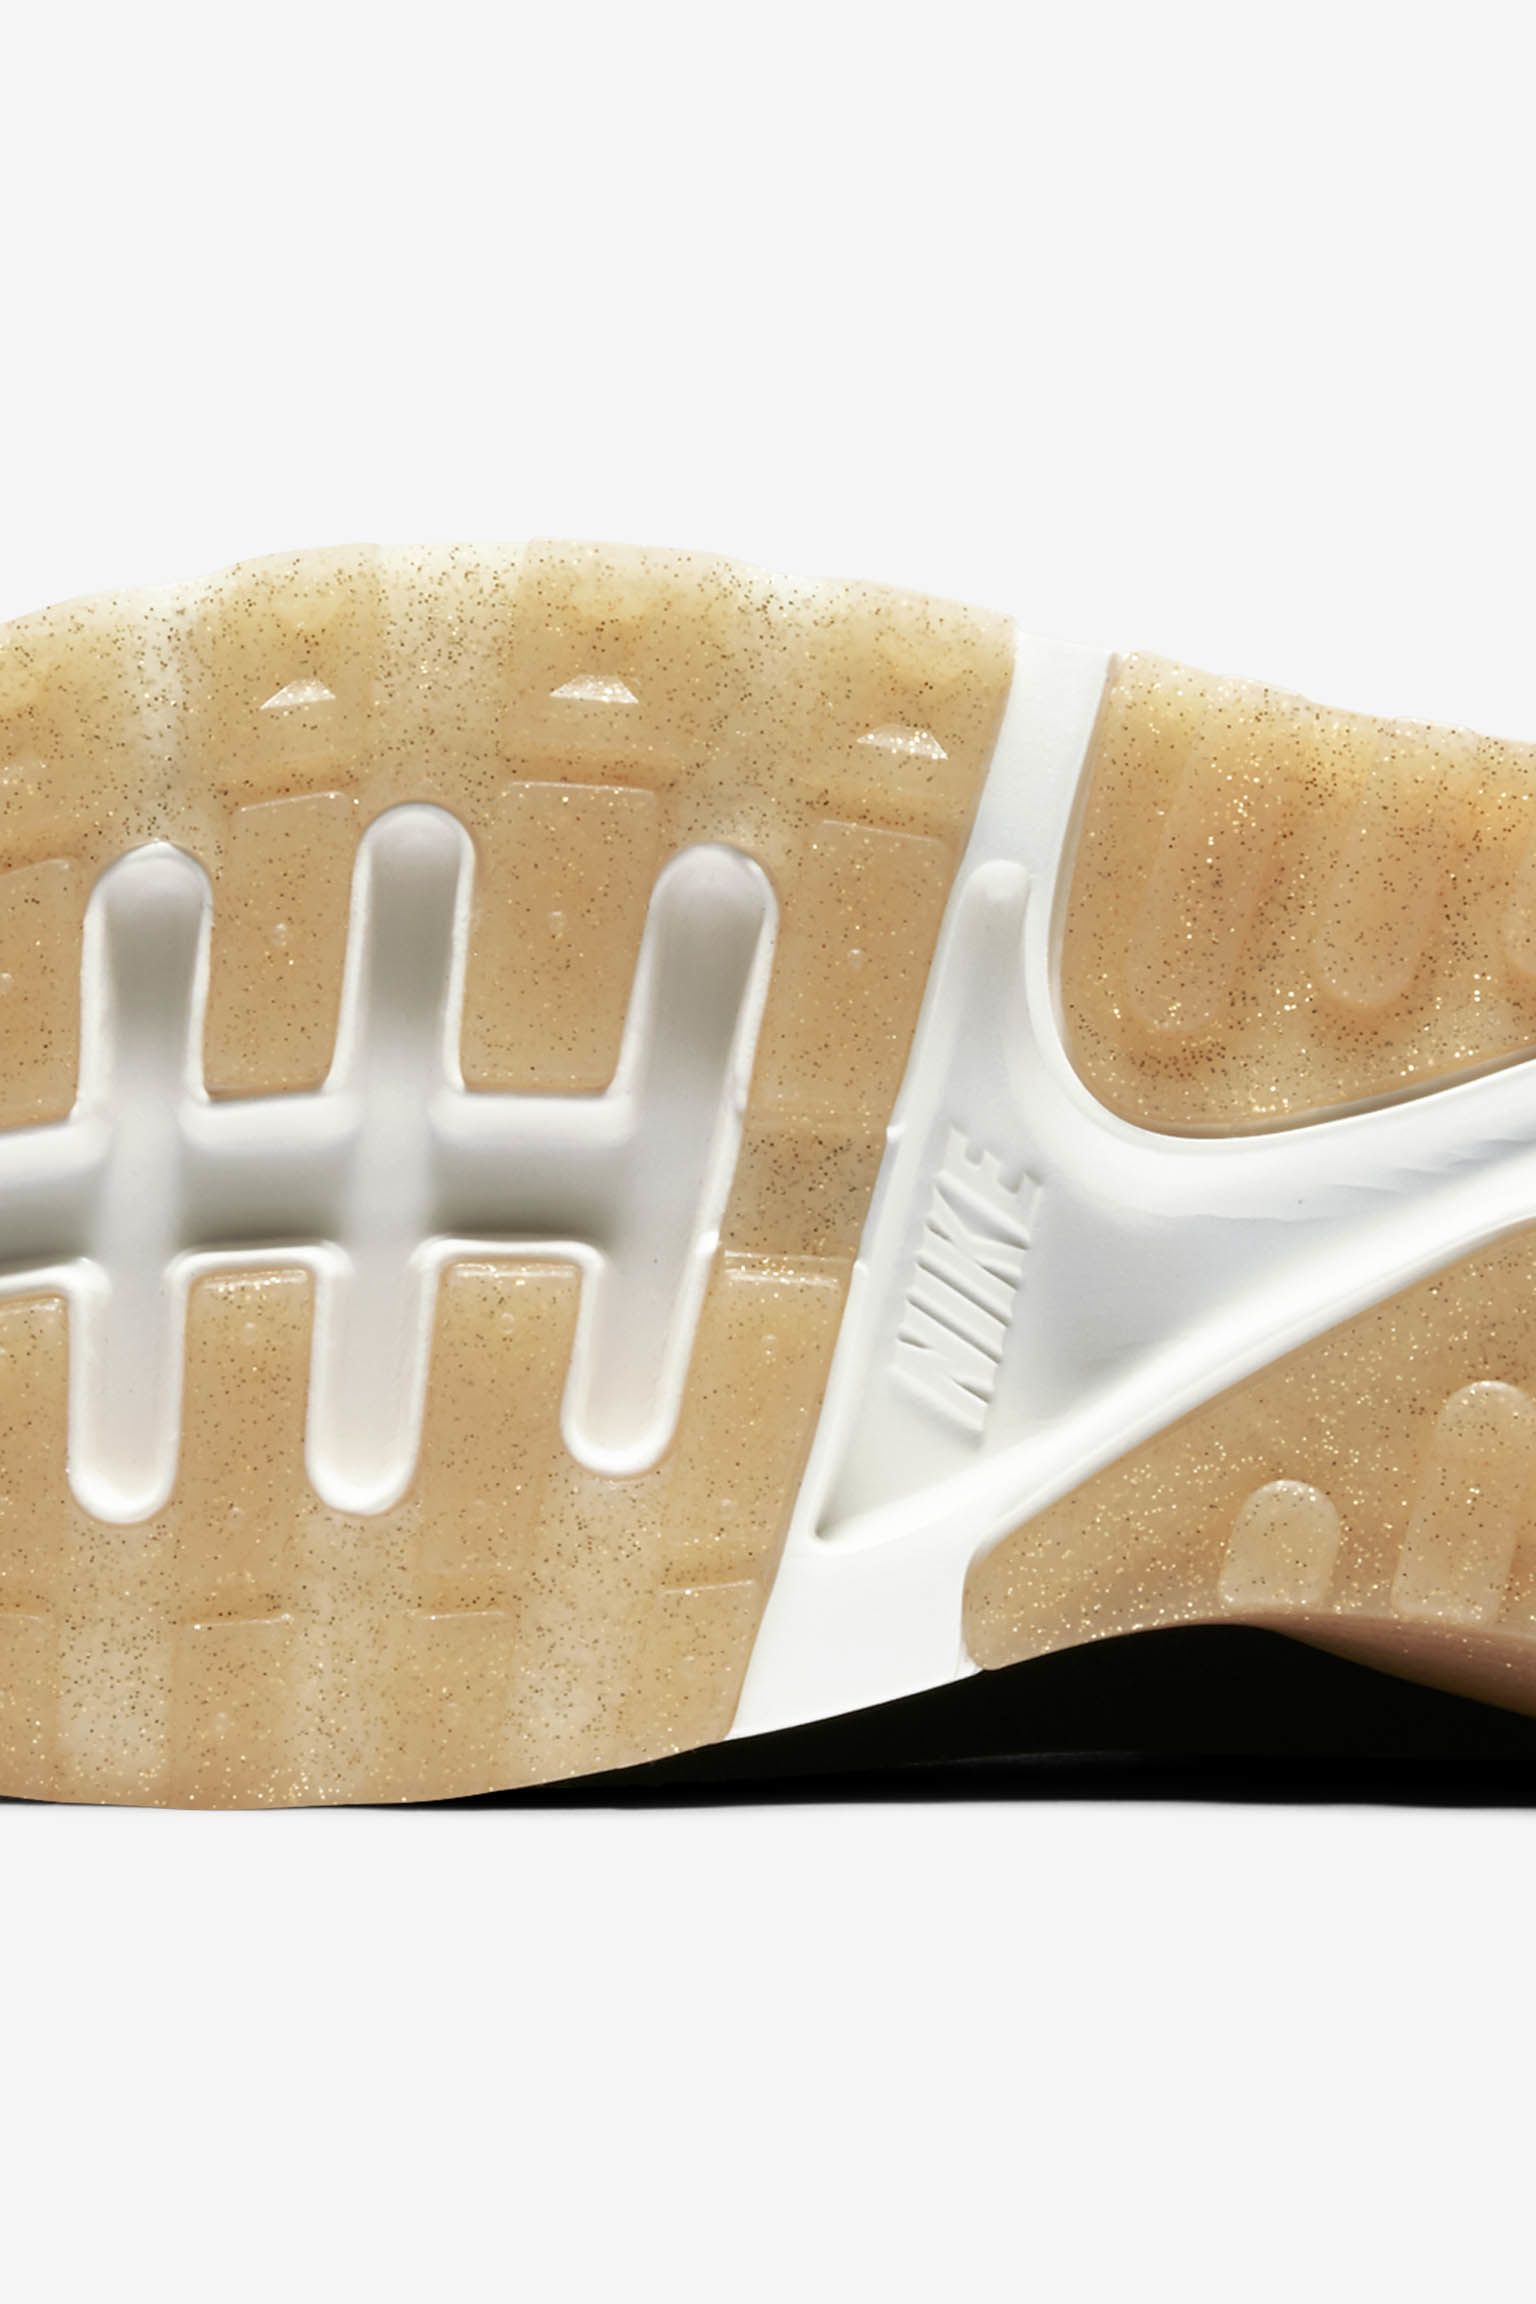 "Buty damskie Nike Air Max 90 Ultra 2.0 Flyknit Metallic ""Black & Metallic Gold"""